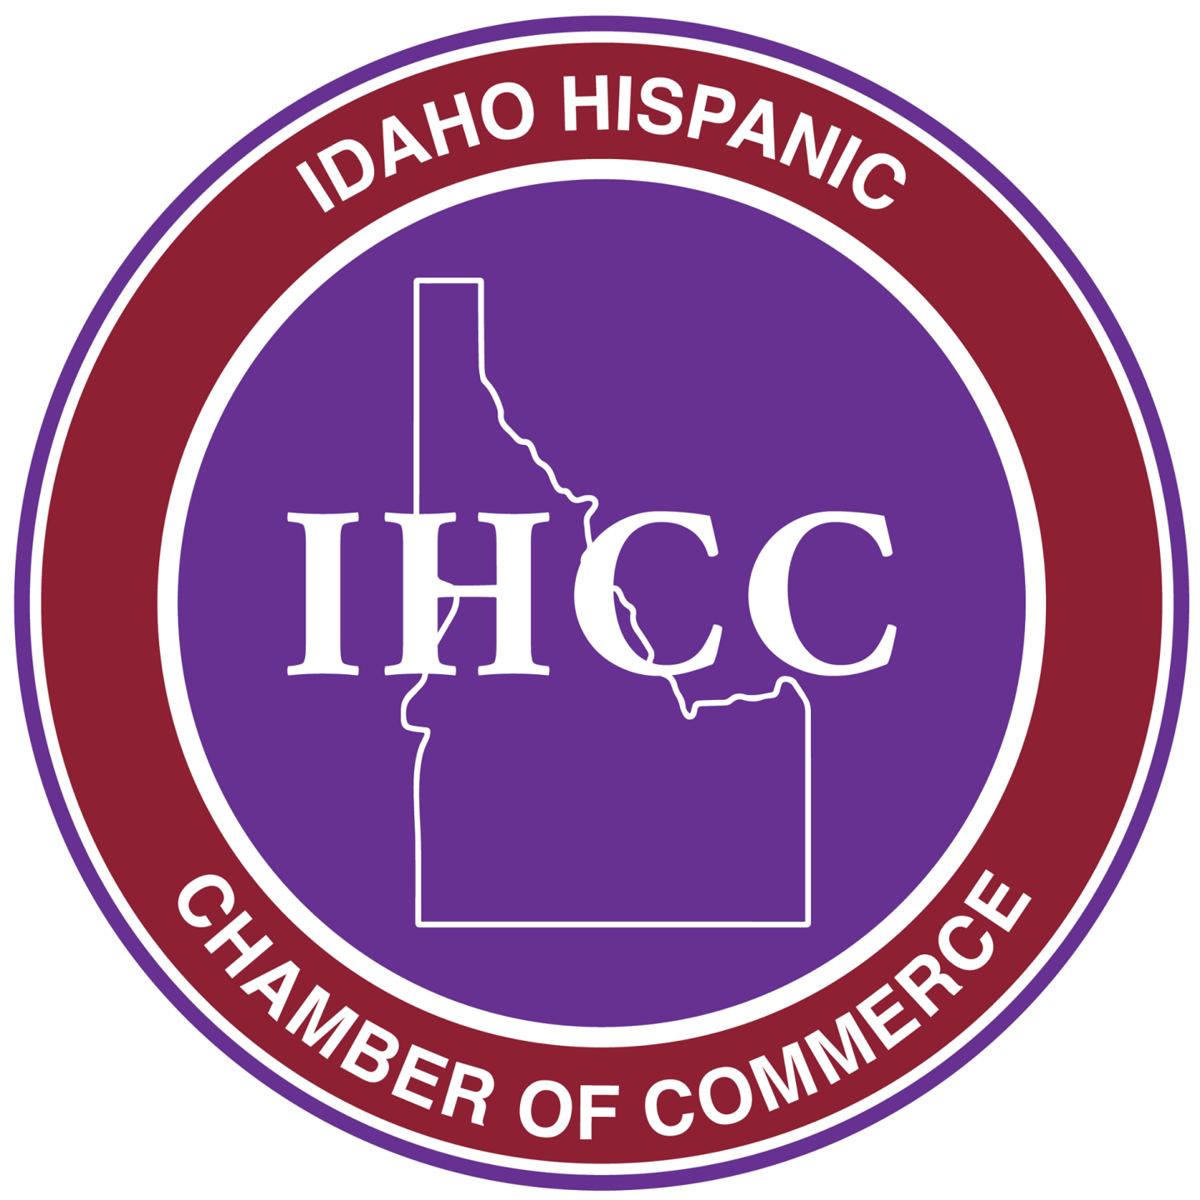 Idaho Hispanic Chamber of Commerce logo